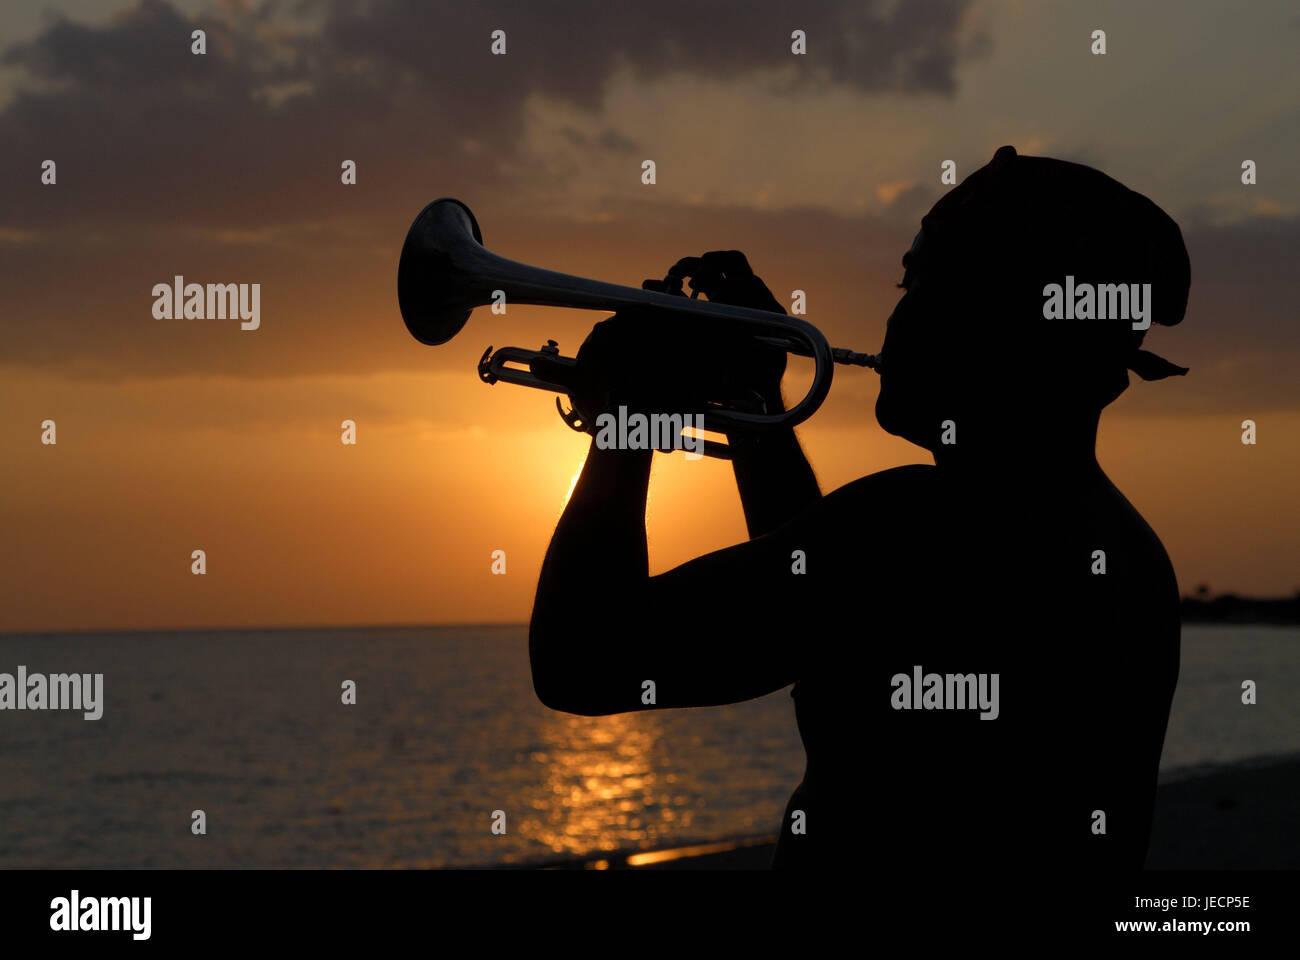 Kuba, Trinidad, Strand, Kontur, Trompeter, Sonnenuntergang, die Karibik, Insel, Person, Mensch, Musikinstrument, Stockbild